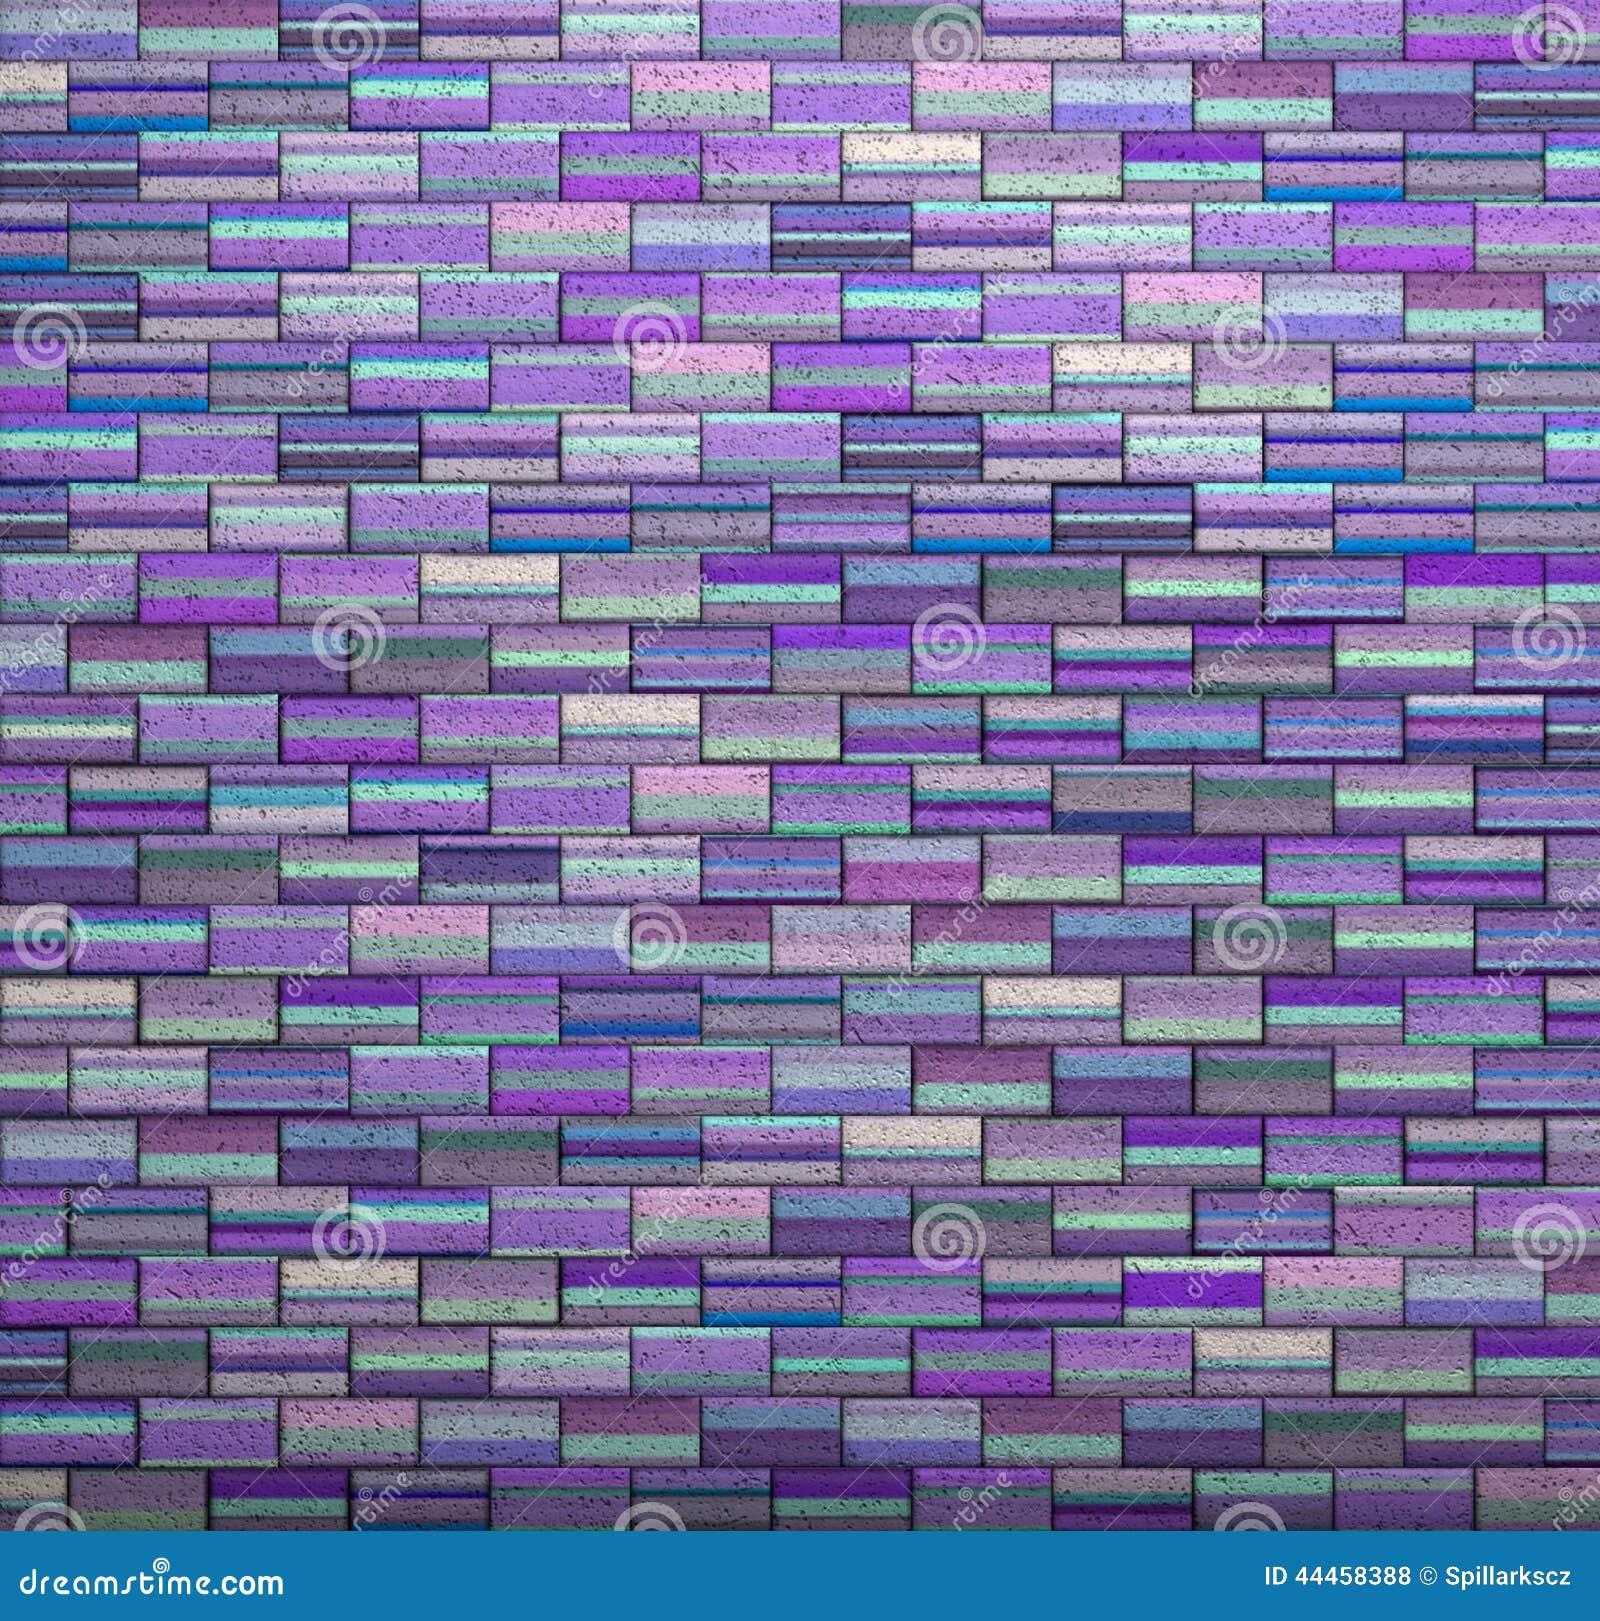 Pebble tiles bathroom floor - Purple Tile Mosaic Wall Floor Grunge Stone 3d Render Stock